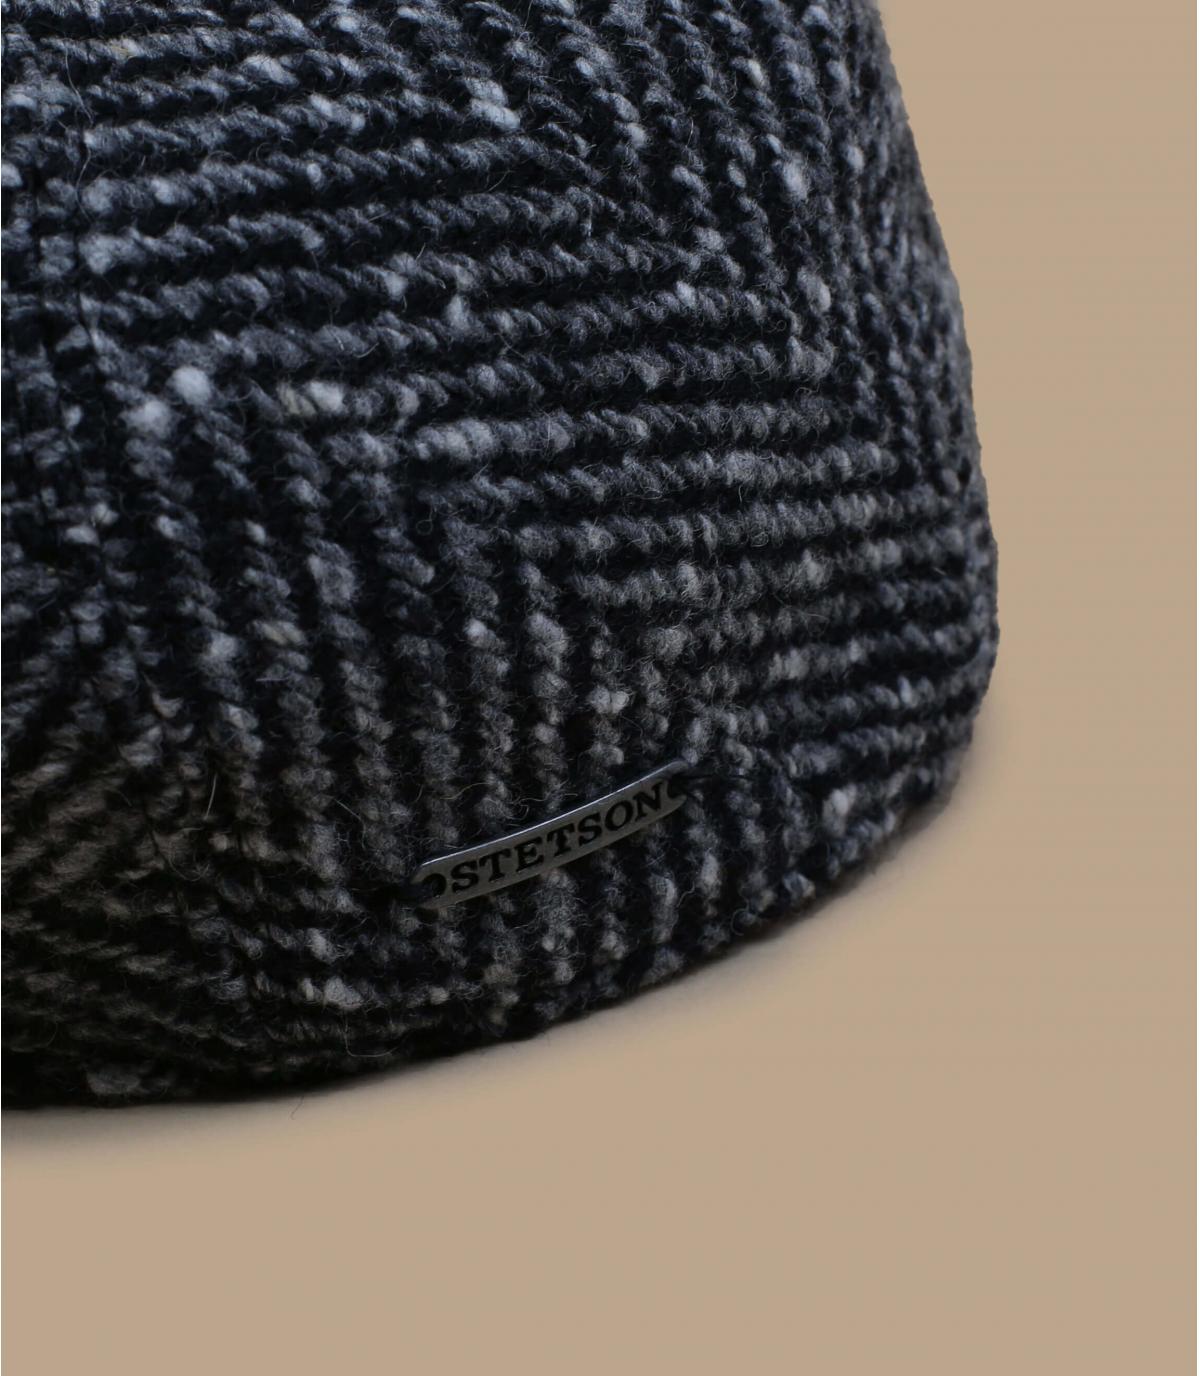 Dettagli Ivy Cap Herringbone black white - image 2